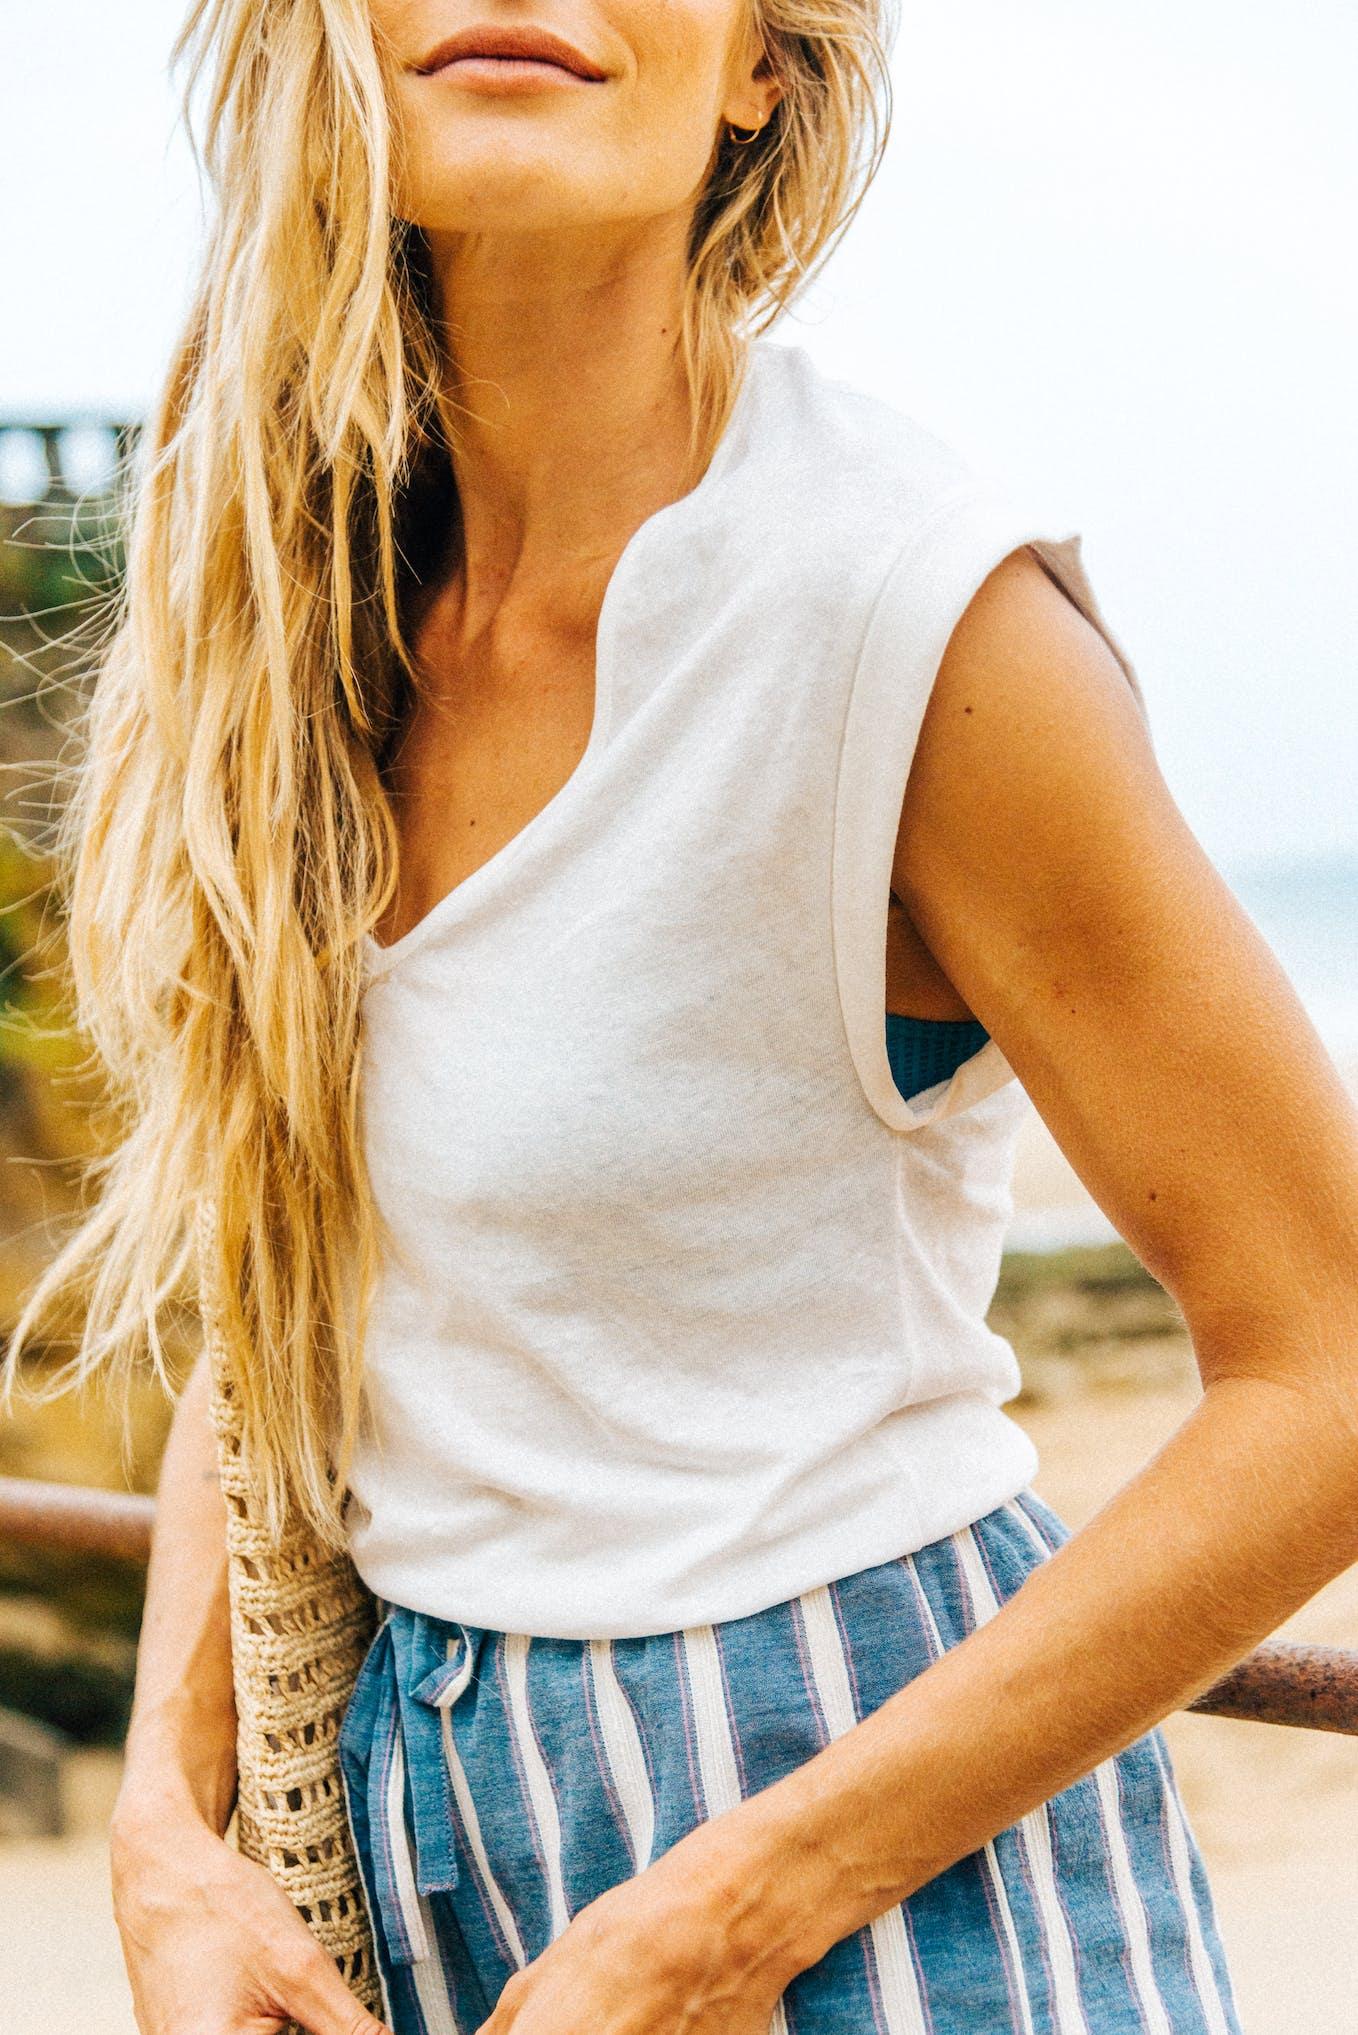 Tee-shirt Balade rêveuse ivoire